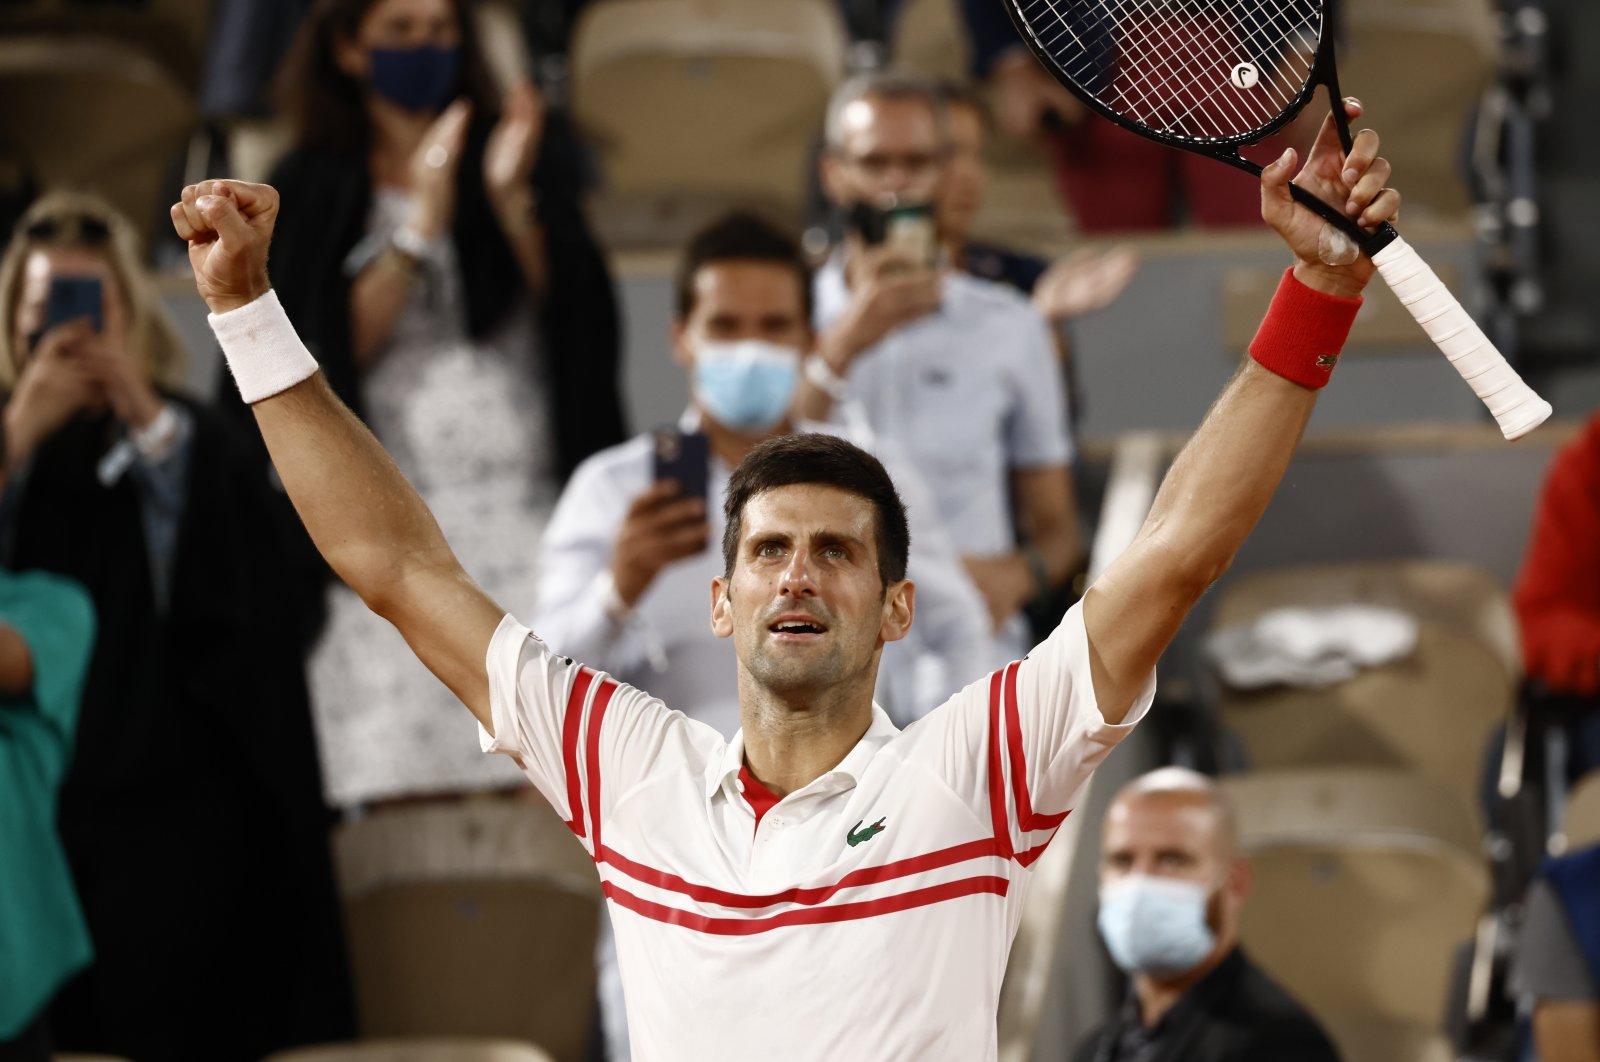 Serbia's Novak Djokovic celebrates winning against Spain's Rafael Nadal during their French Open semifinal match at Roland Garros, Paris, France, June 11, 2021. (EPA Photo)